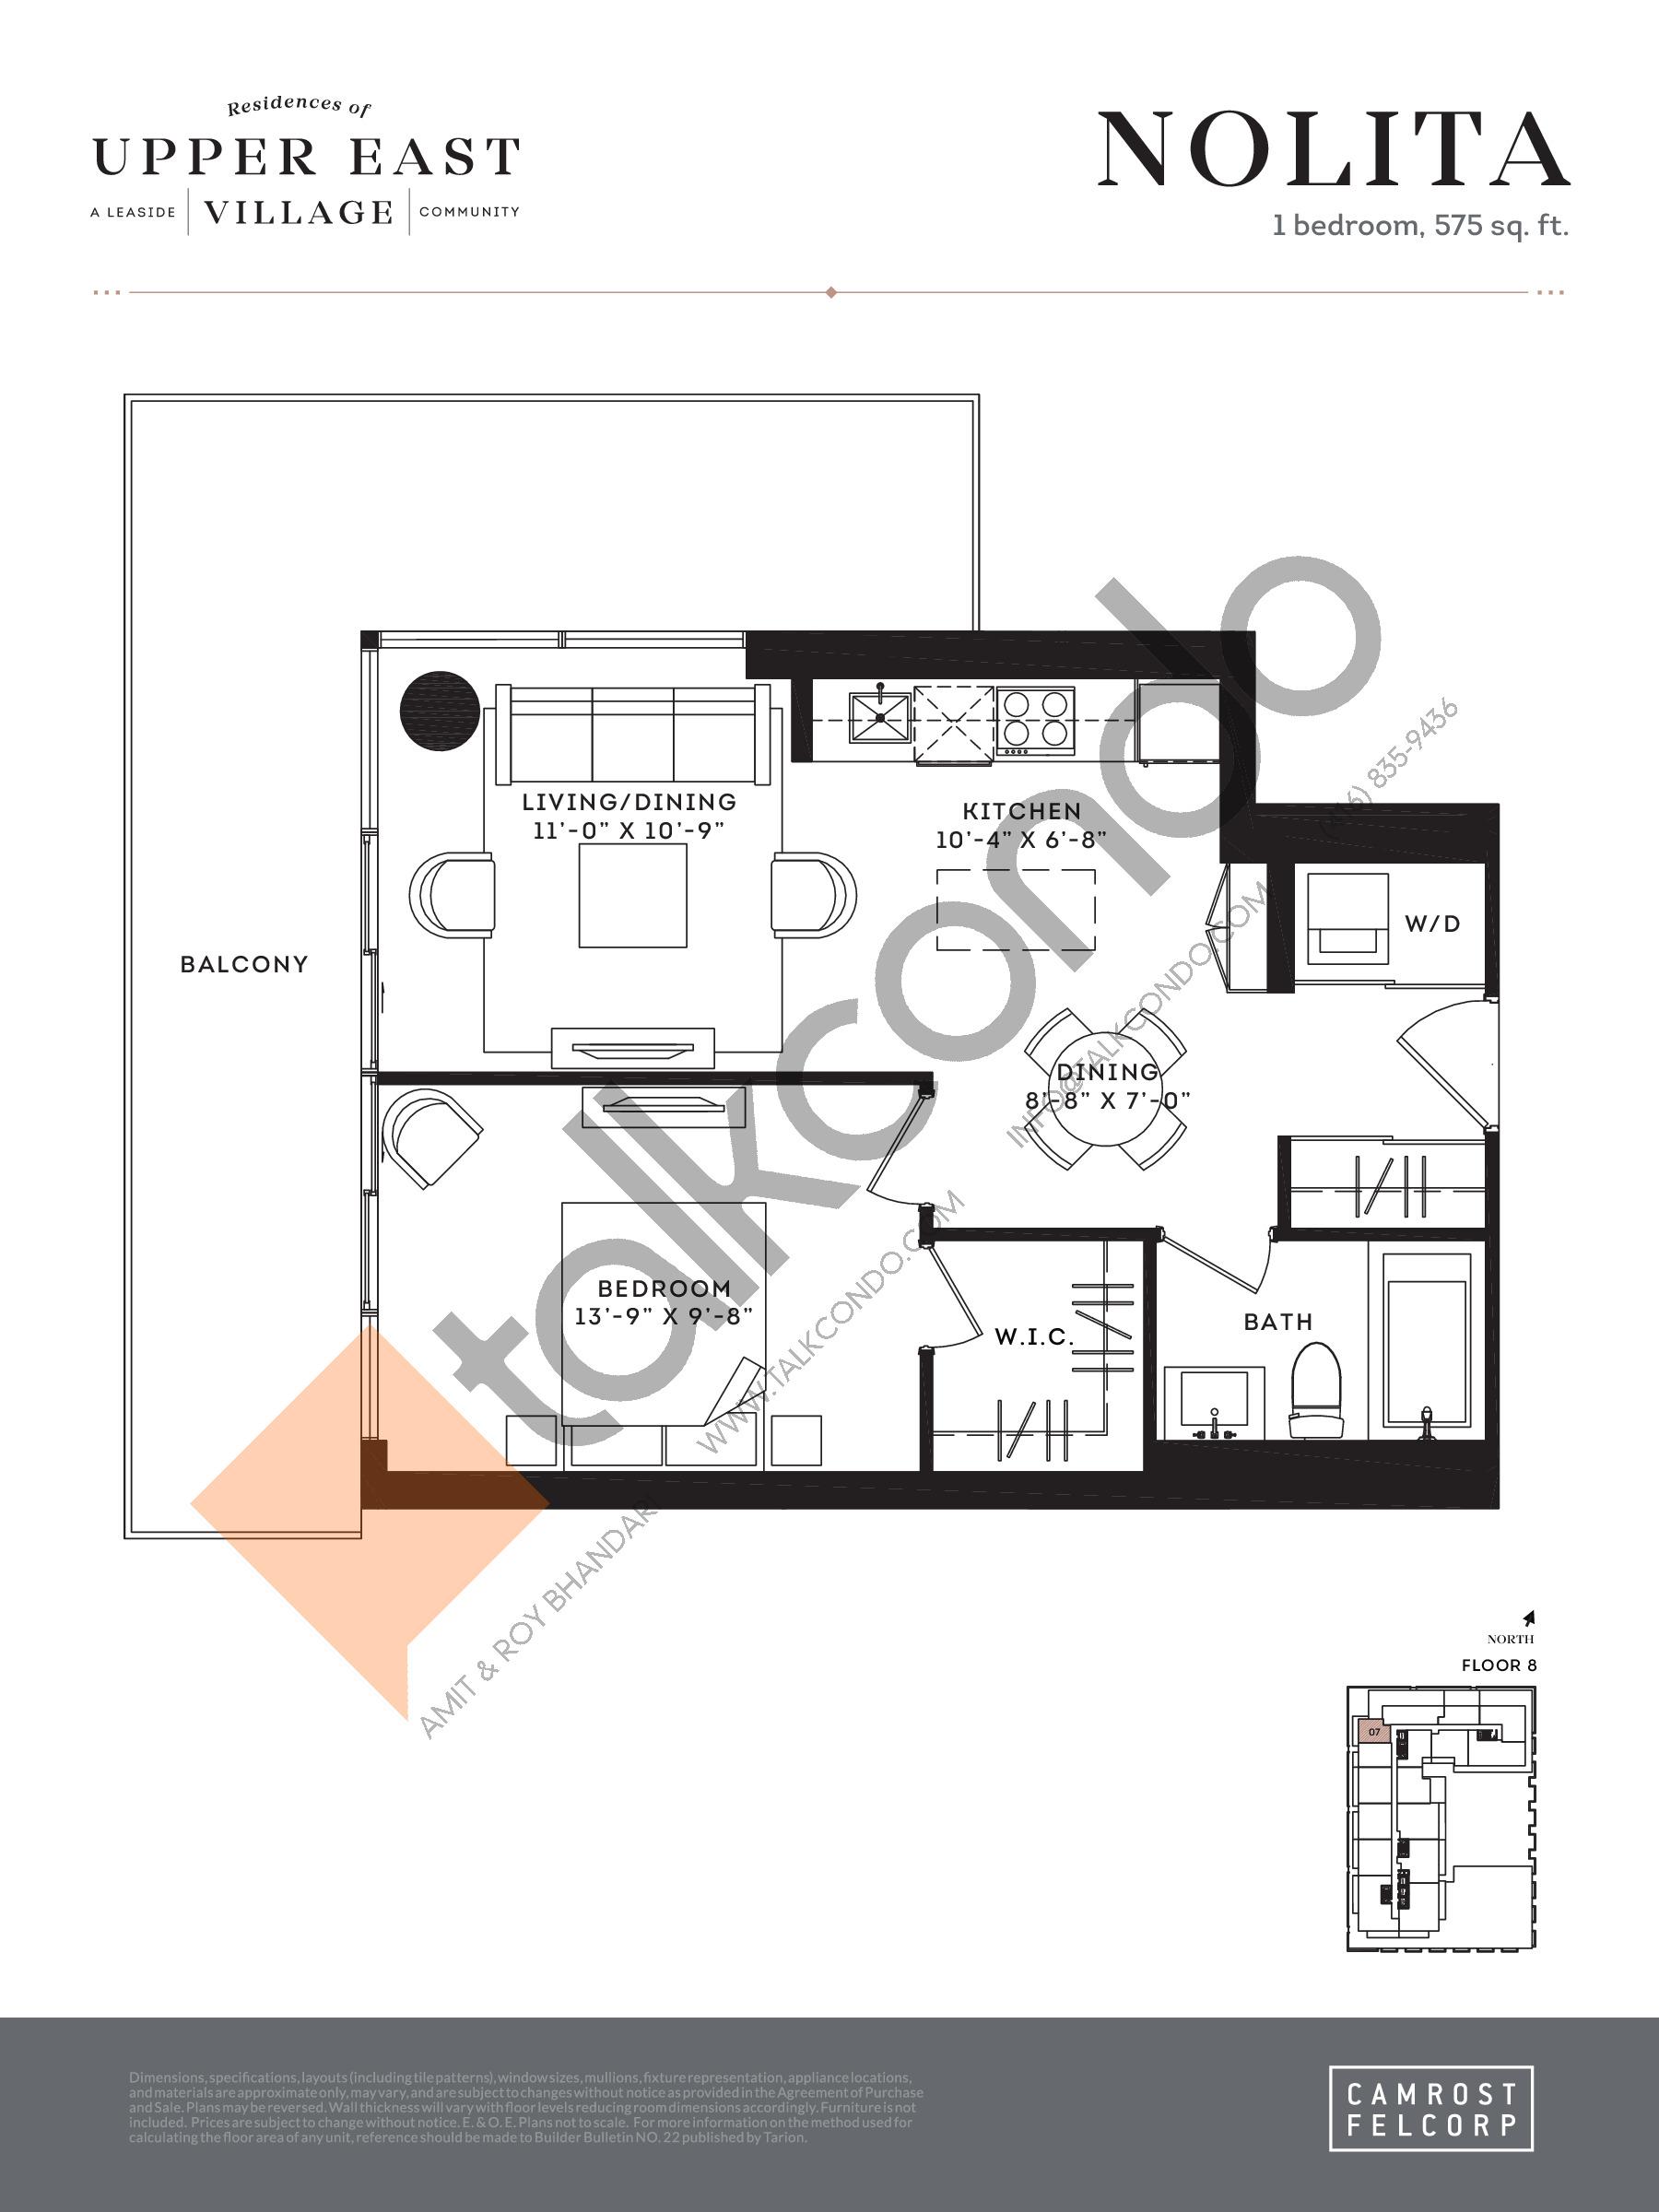 Nolita Floor Plan at Upper East Village Condos - 575 sq.ft